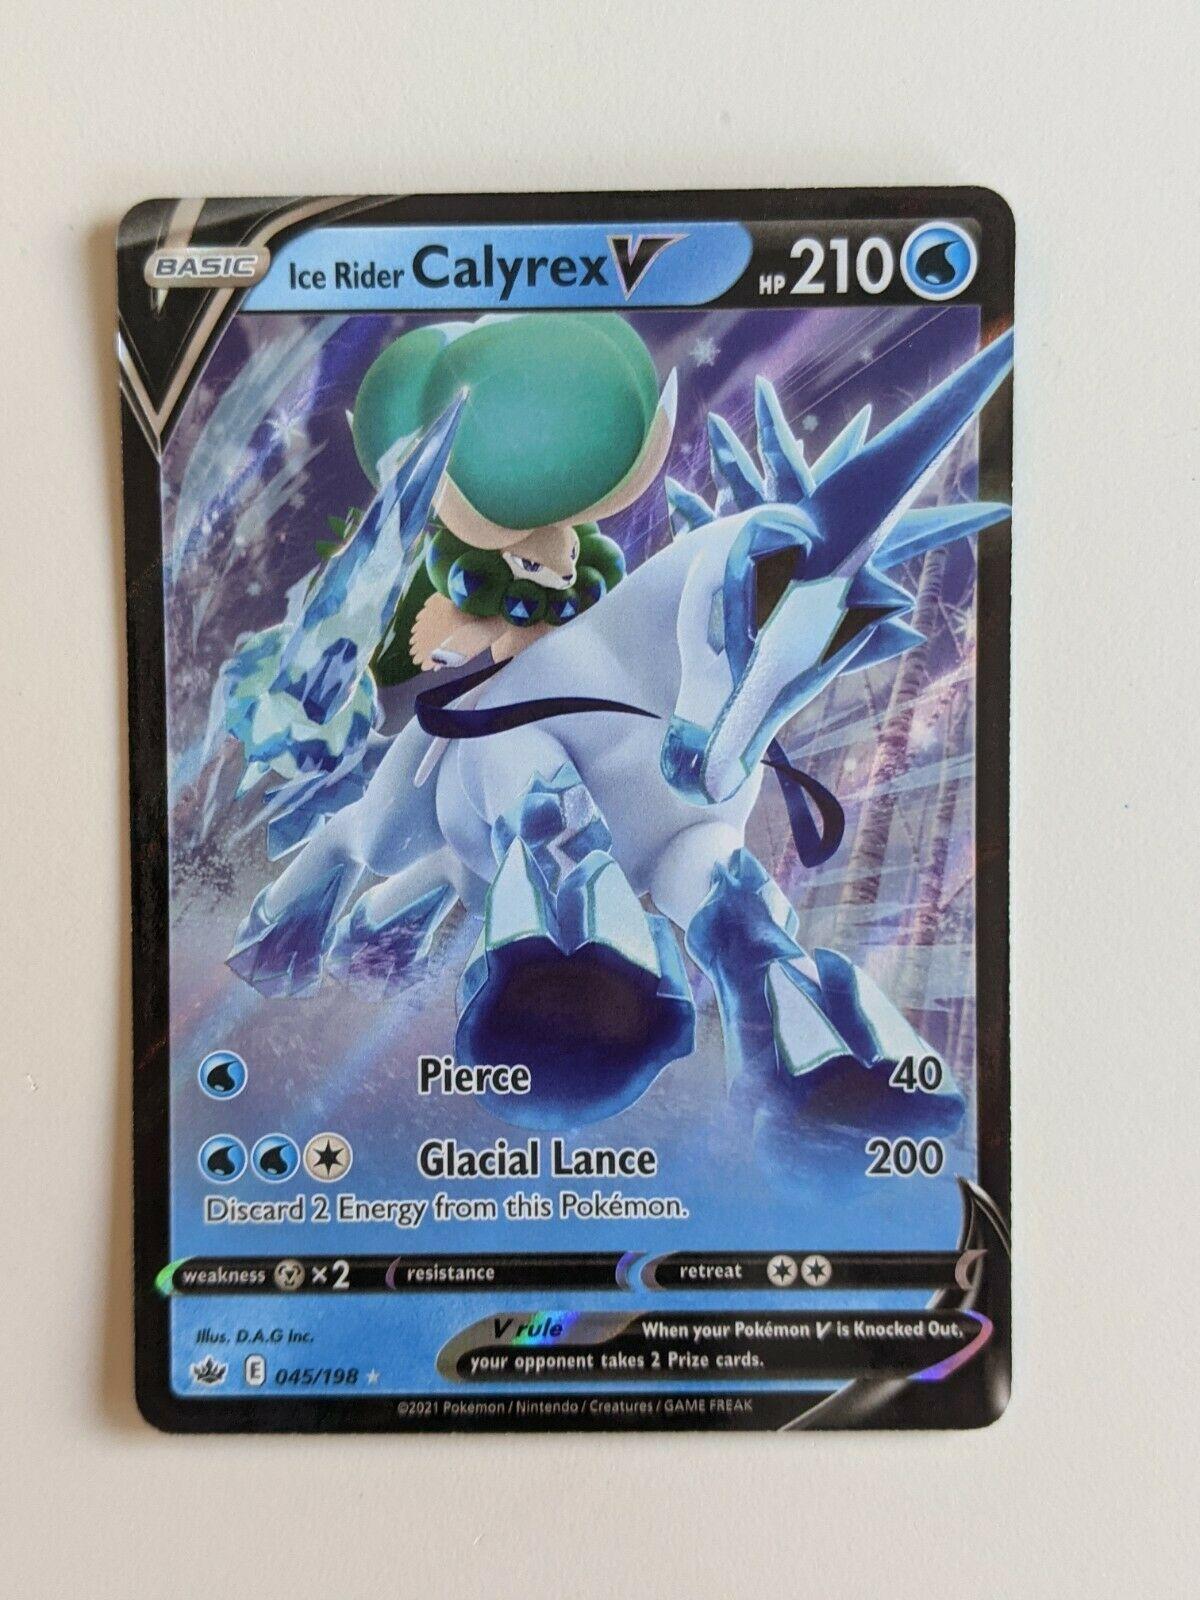 Ice Rider Calyrex V 045/198 Pokémon TCG Chilling Reign Ultra Rare Near Mint